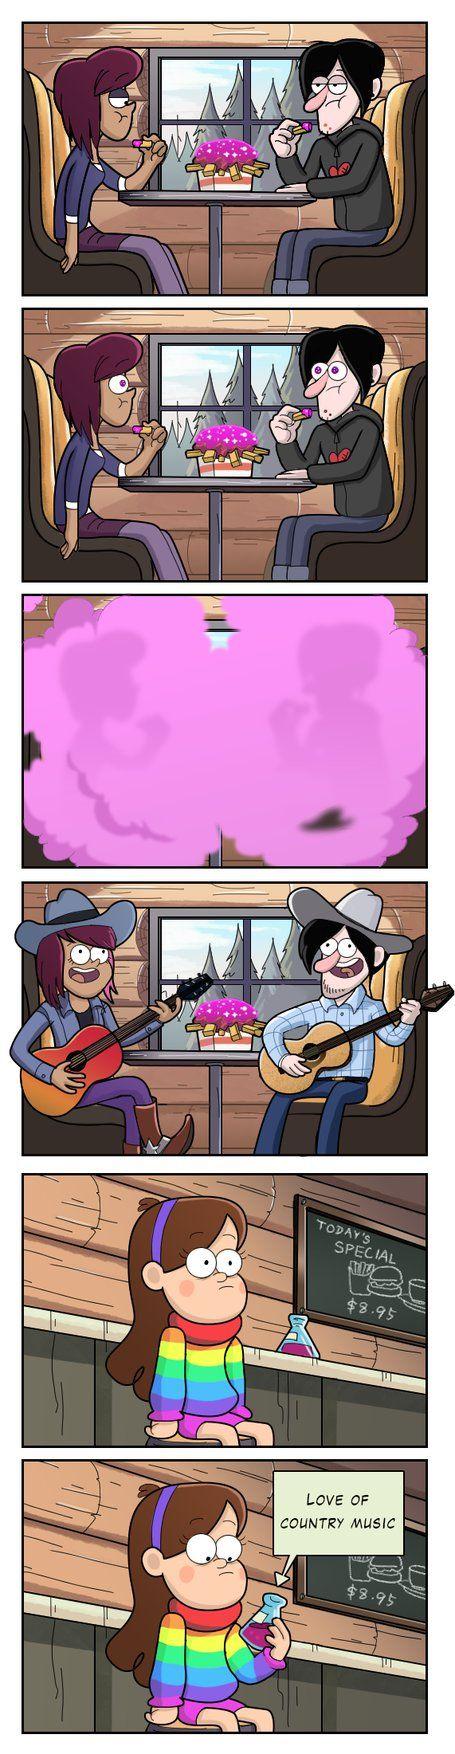 amor a la música countri